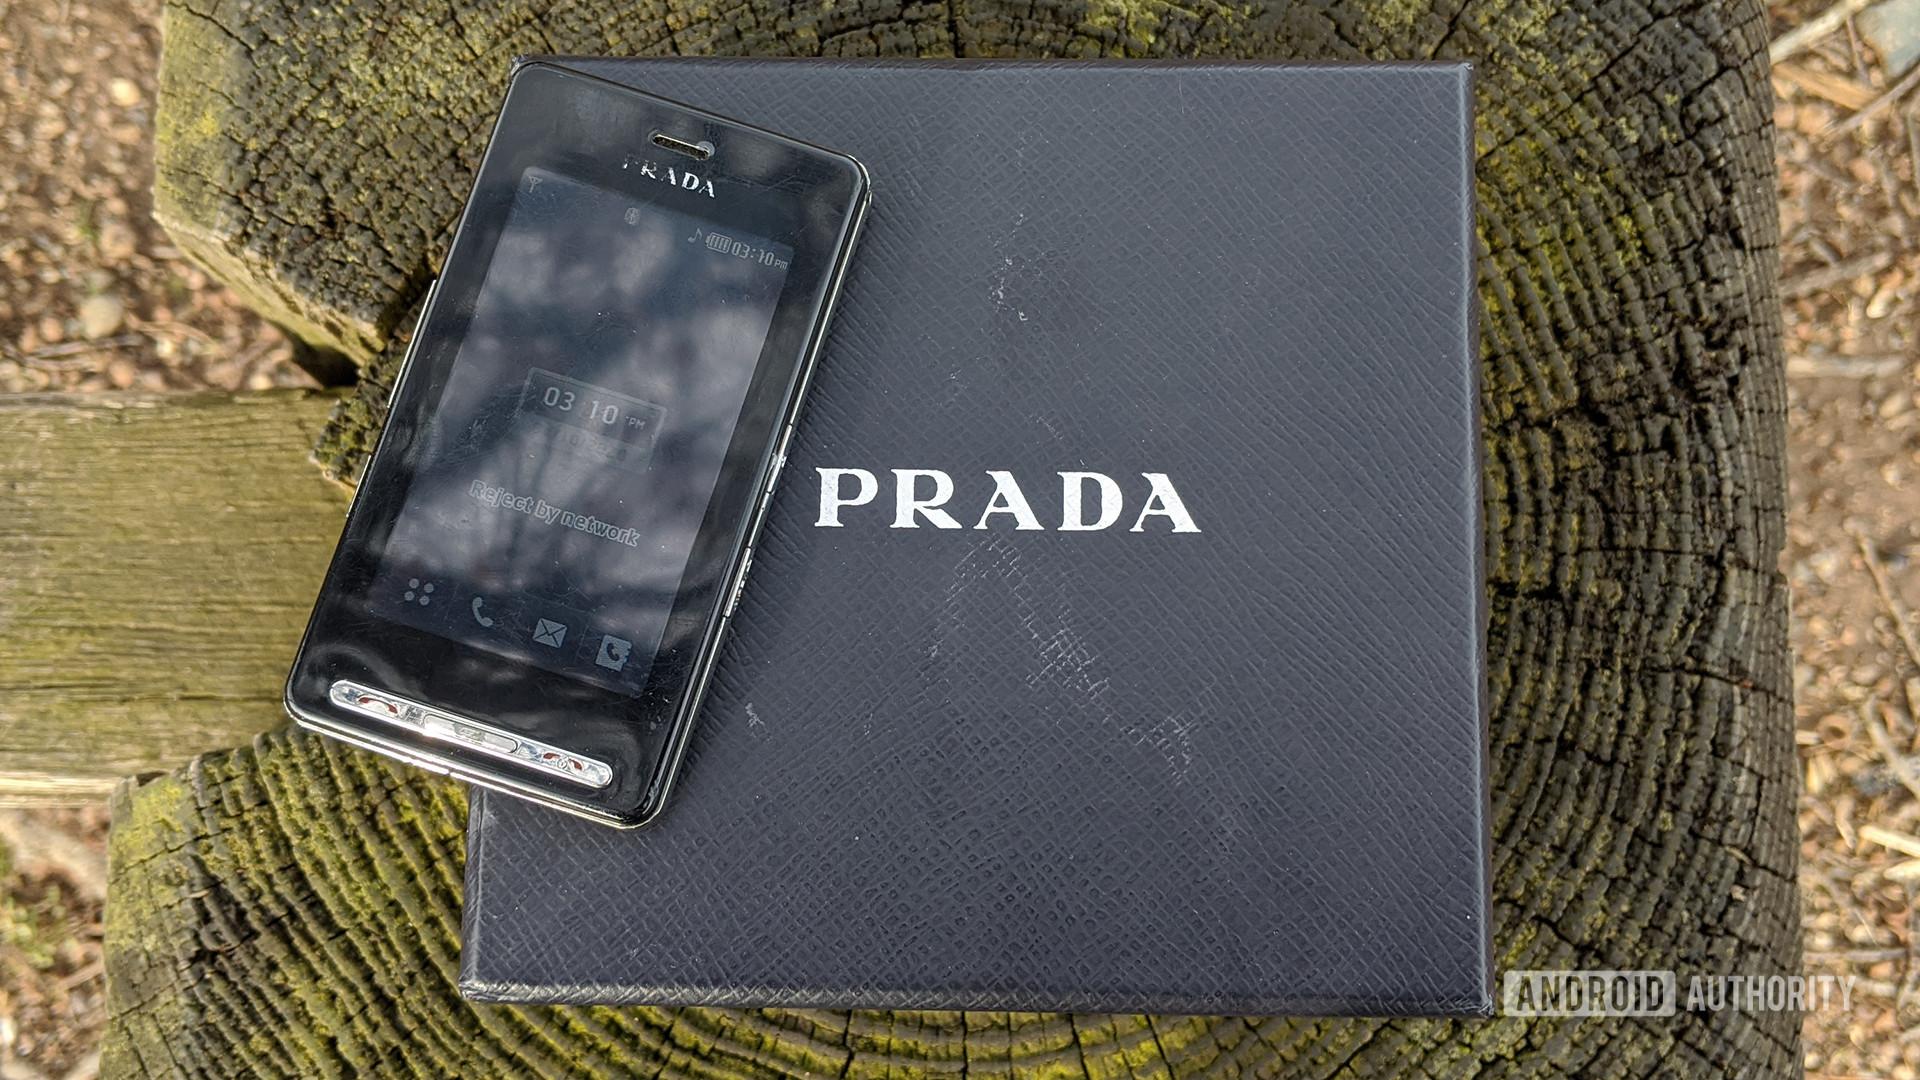 LG Prada KE850 On Top Of Prada Box